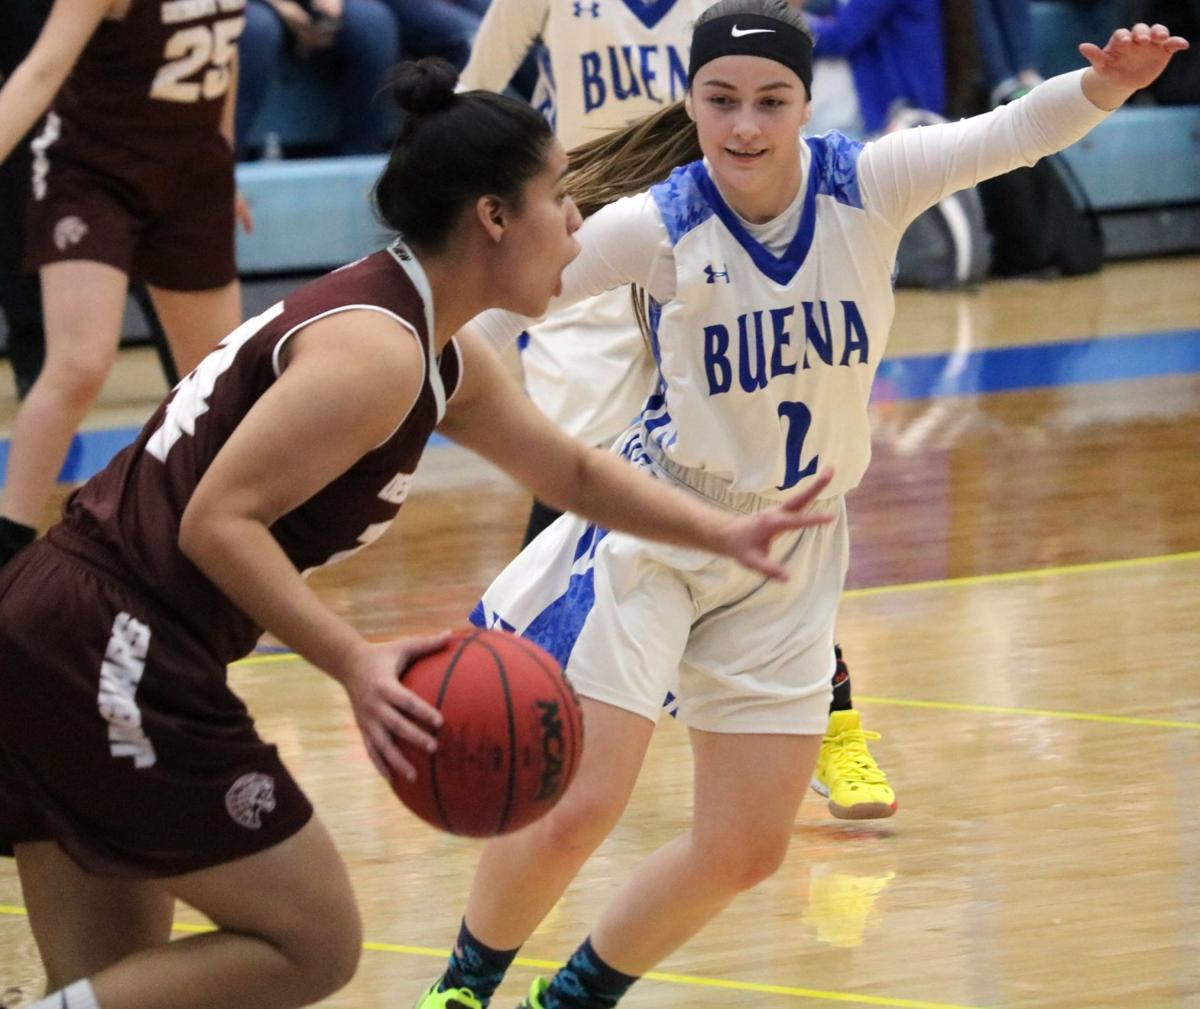 Buena girls basketball vs Desert View